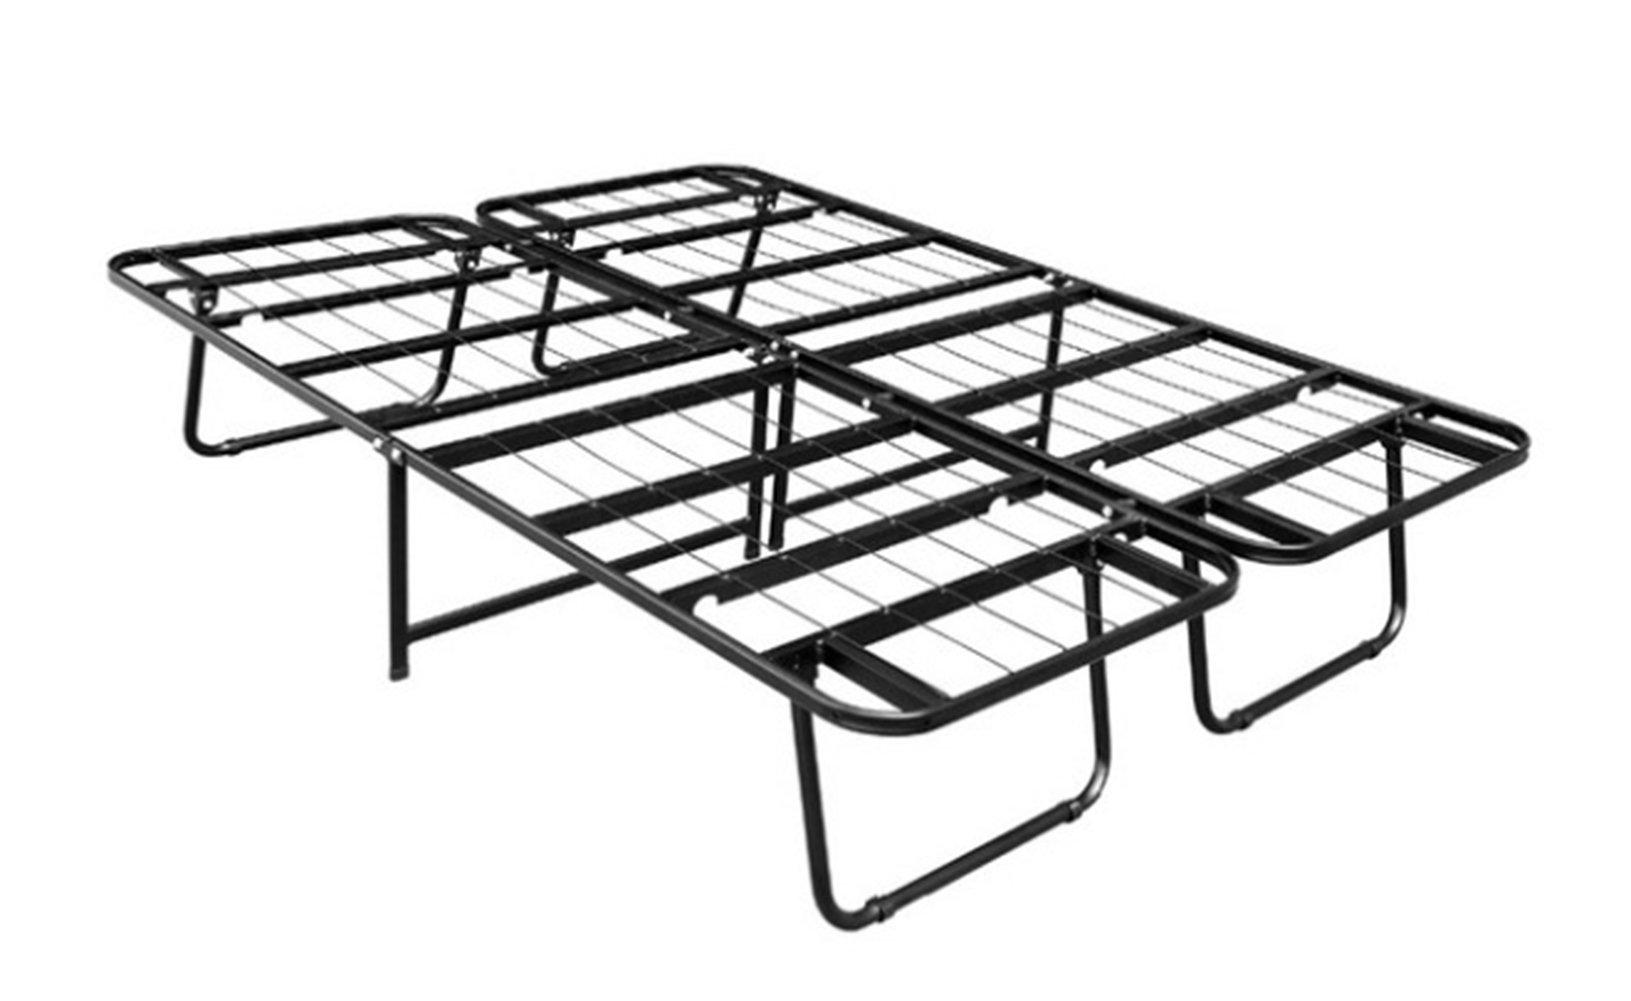 Alaska2You 15.35 Inch SmartBase Mattress Foundation / Platform Bed Frame / Box Spring Replacement / Quiet Noise-Free / Maximum Under-bed Storage, Queen